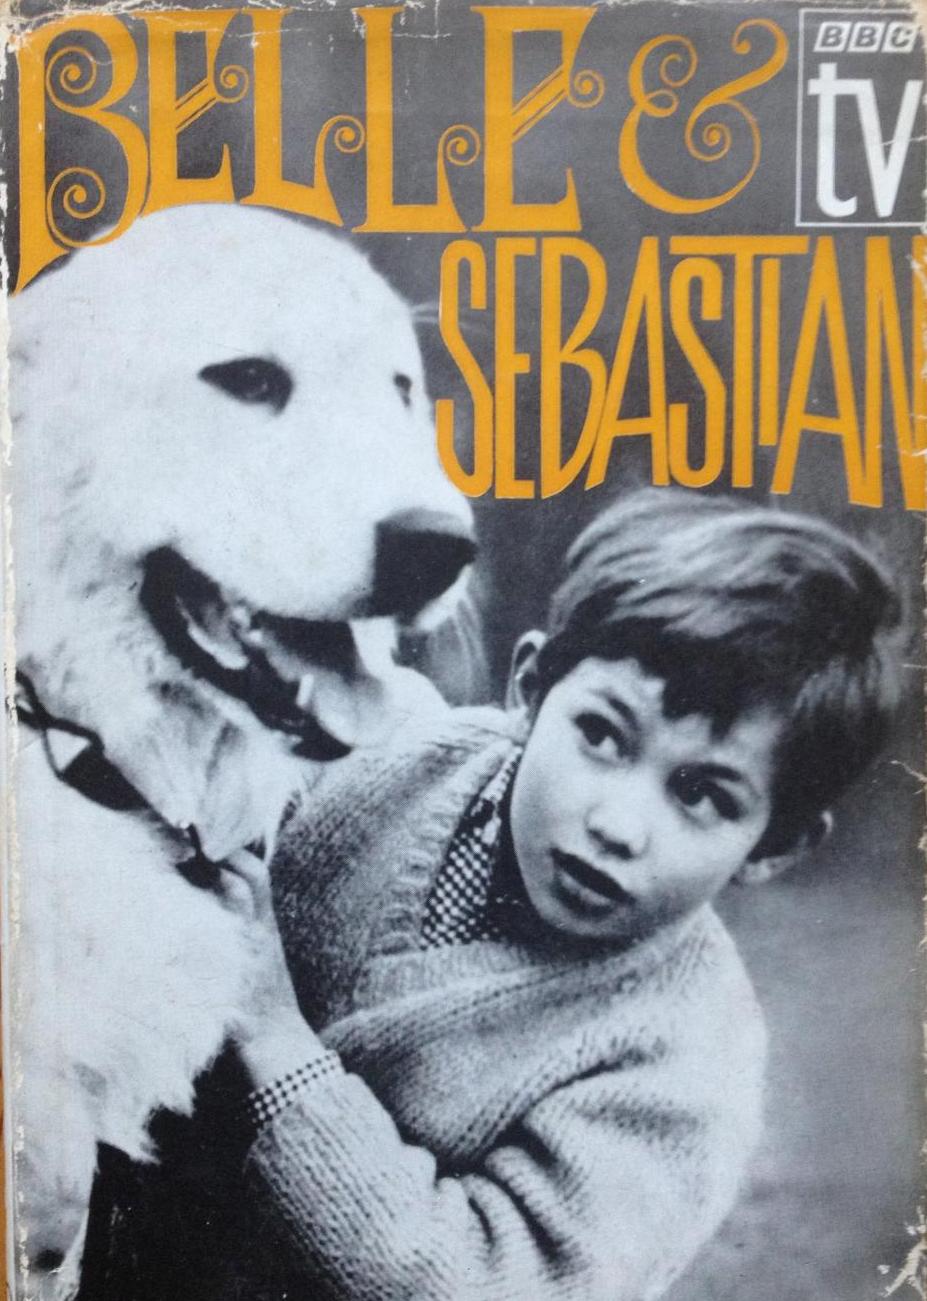 Belle And Sebastian by Peggy Miller (BBC Books, 1967).